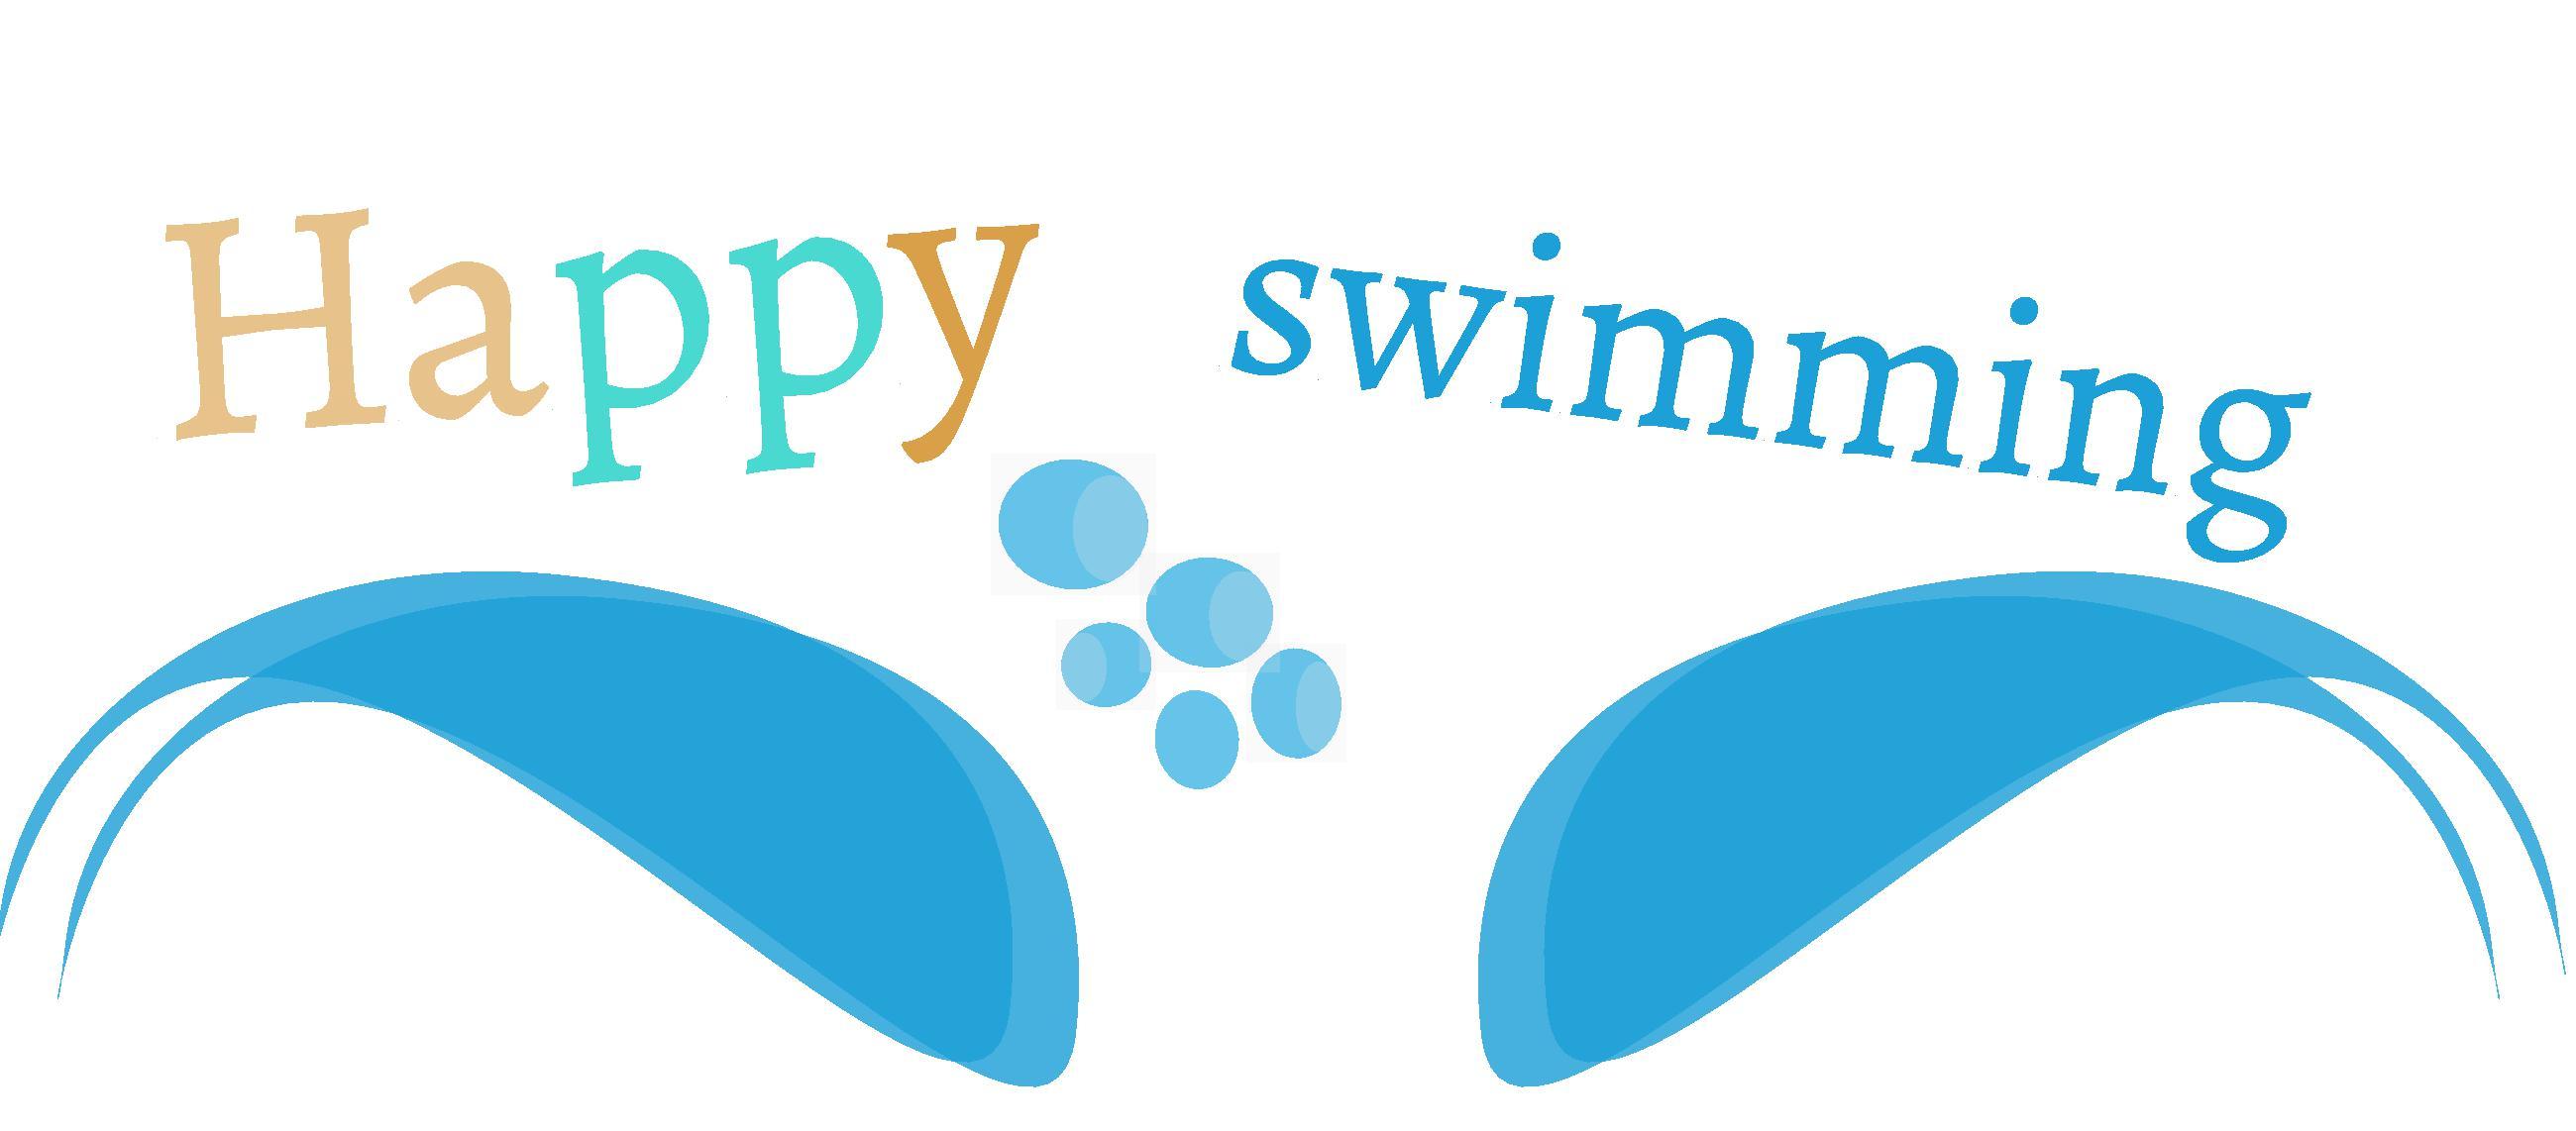 Логотип для  детского бассейна. фото f_1055c77e0fa75a46.jpg